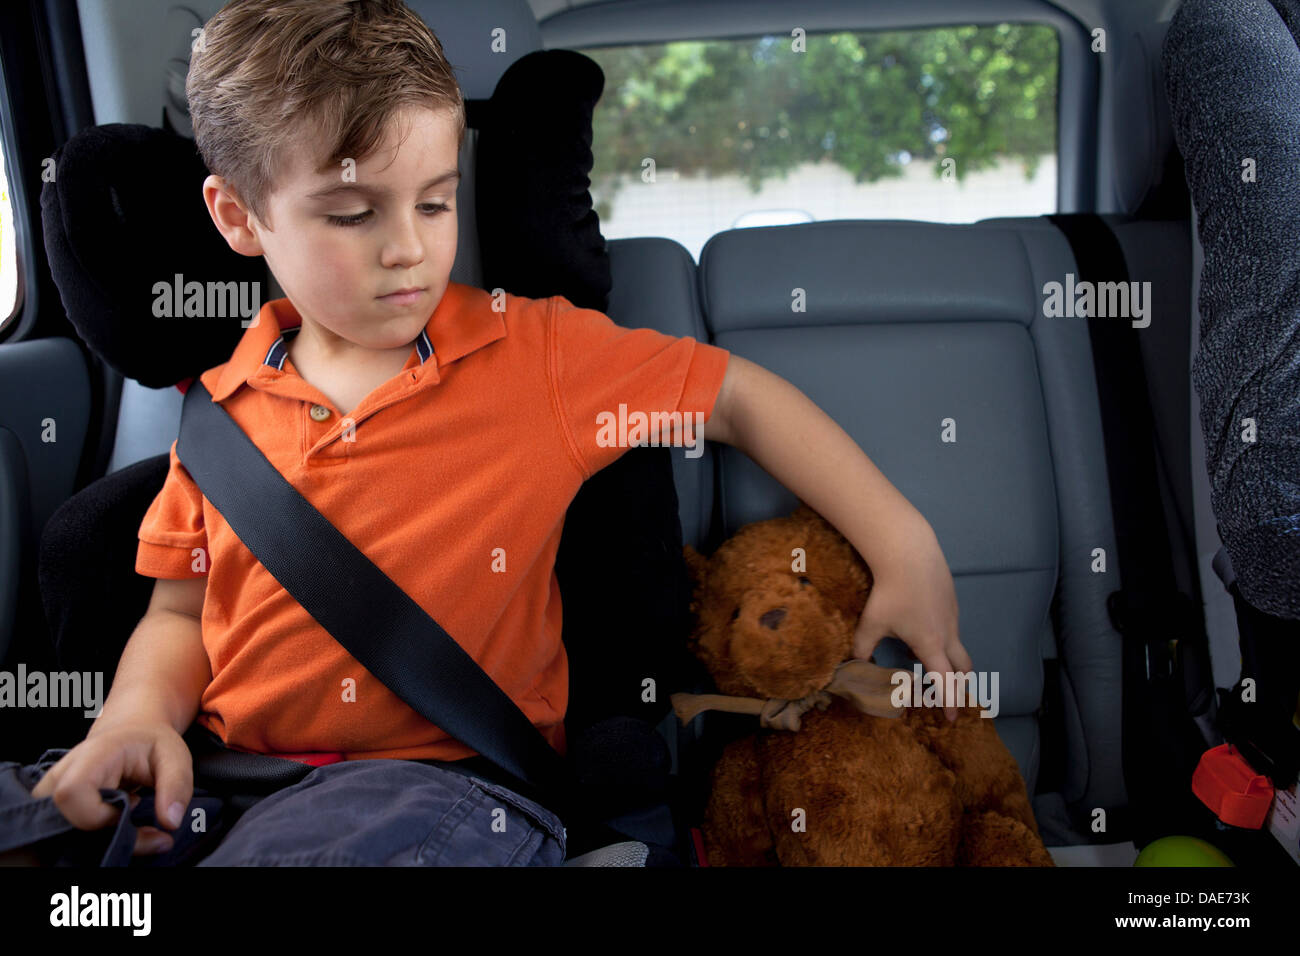 teddy bear in car stockfotos teddy bear in car bilder. Black Bedroom Furniture Sets. Home Design Ideas